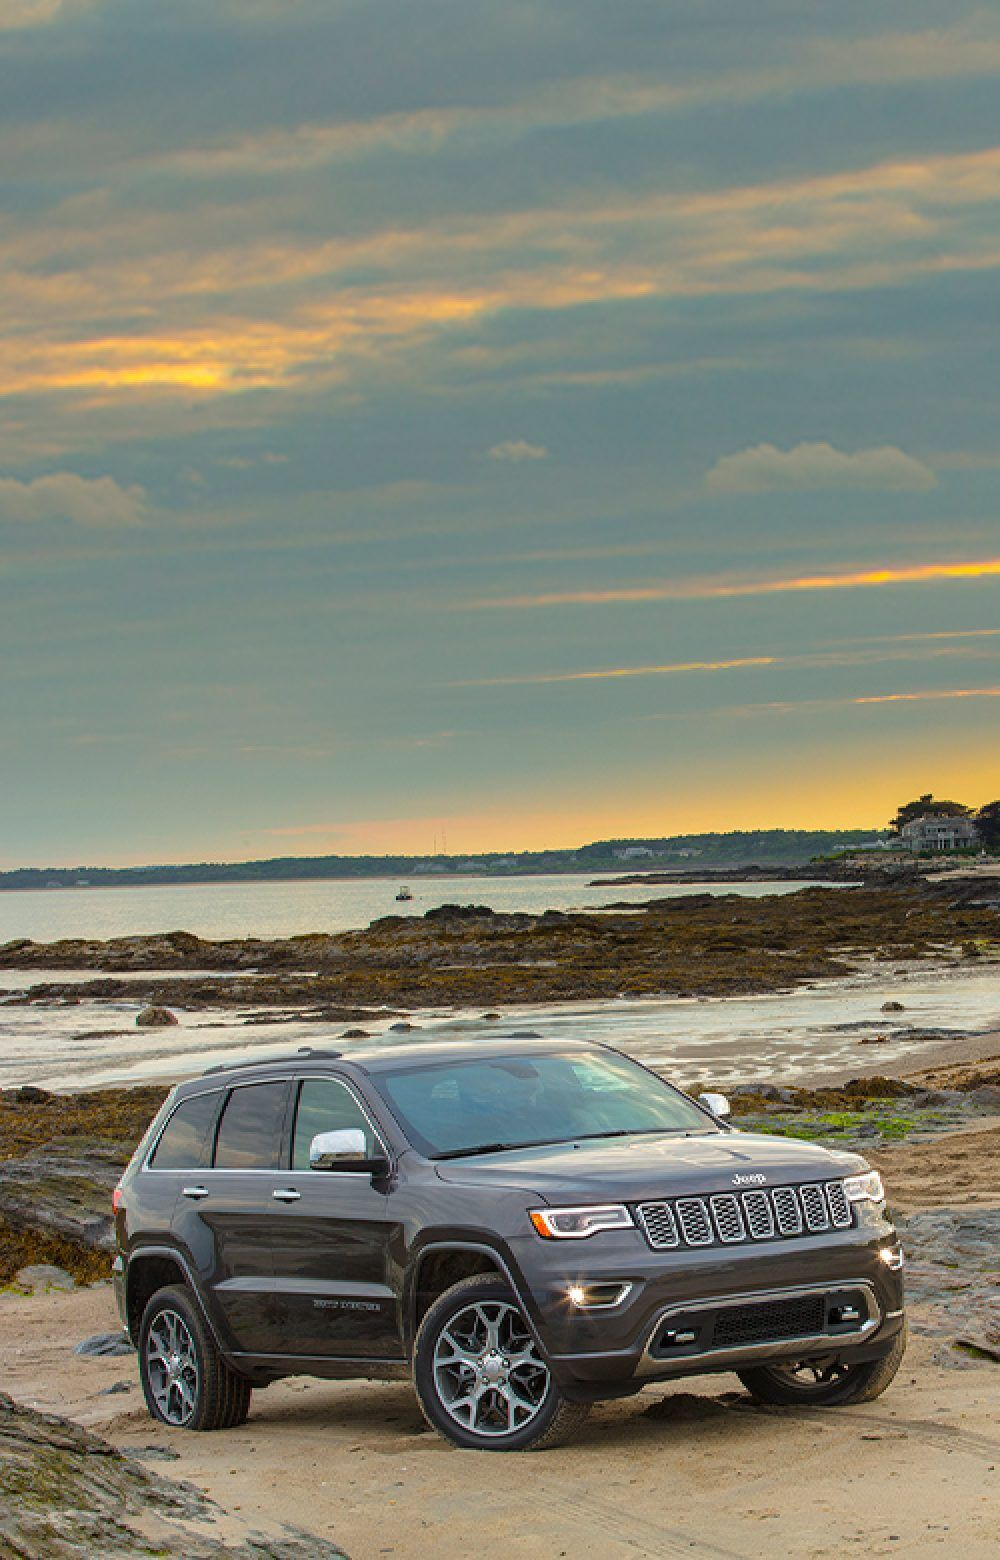 2020 Jeep Grand Cherokee Distinct Look Of Luxury In 2020 Jeep Grand Grand Cherokee Overland Jeep Grand Cherokee